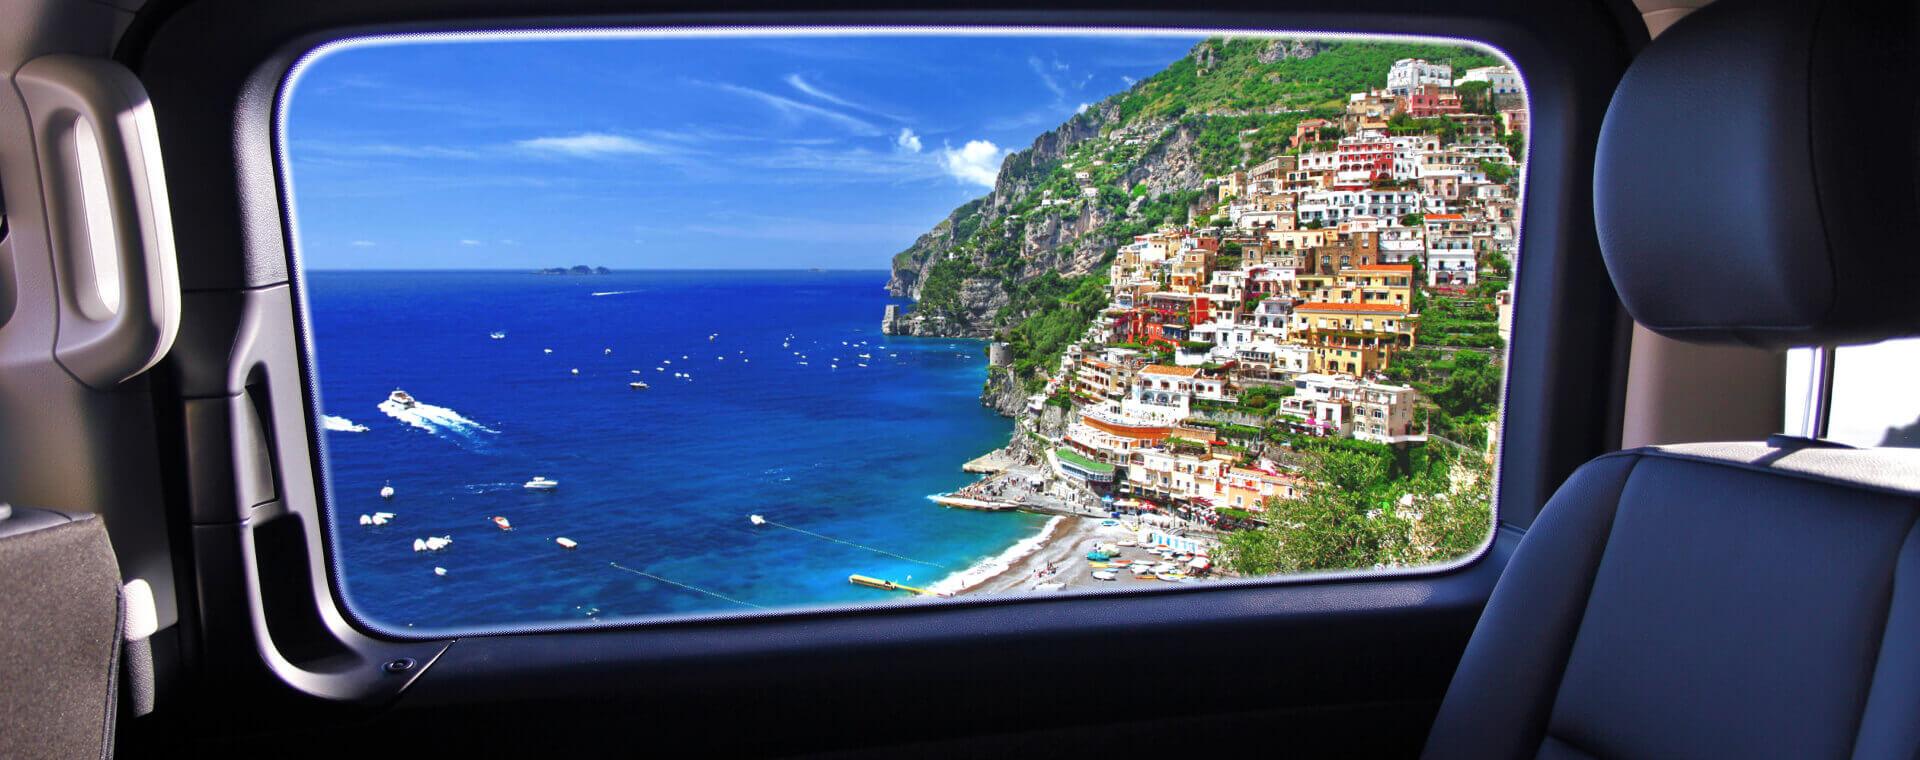 Foto di AmalfiDriver.com Tours %26 Transfers di Napoli  Campania  Italia